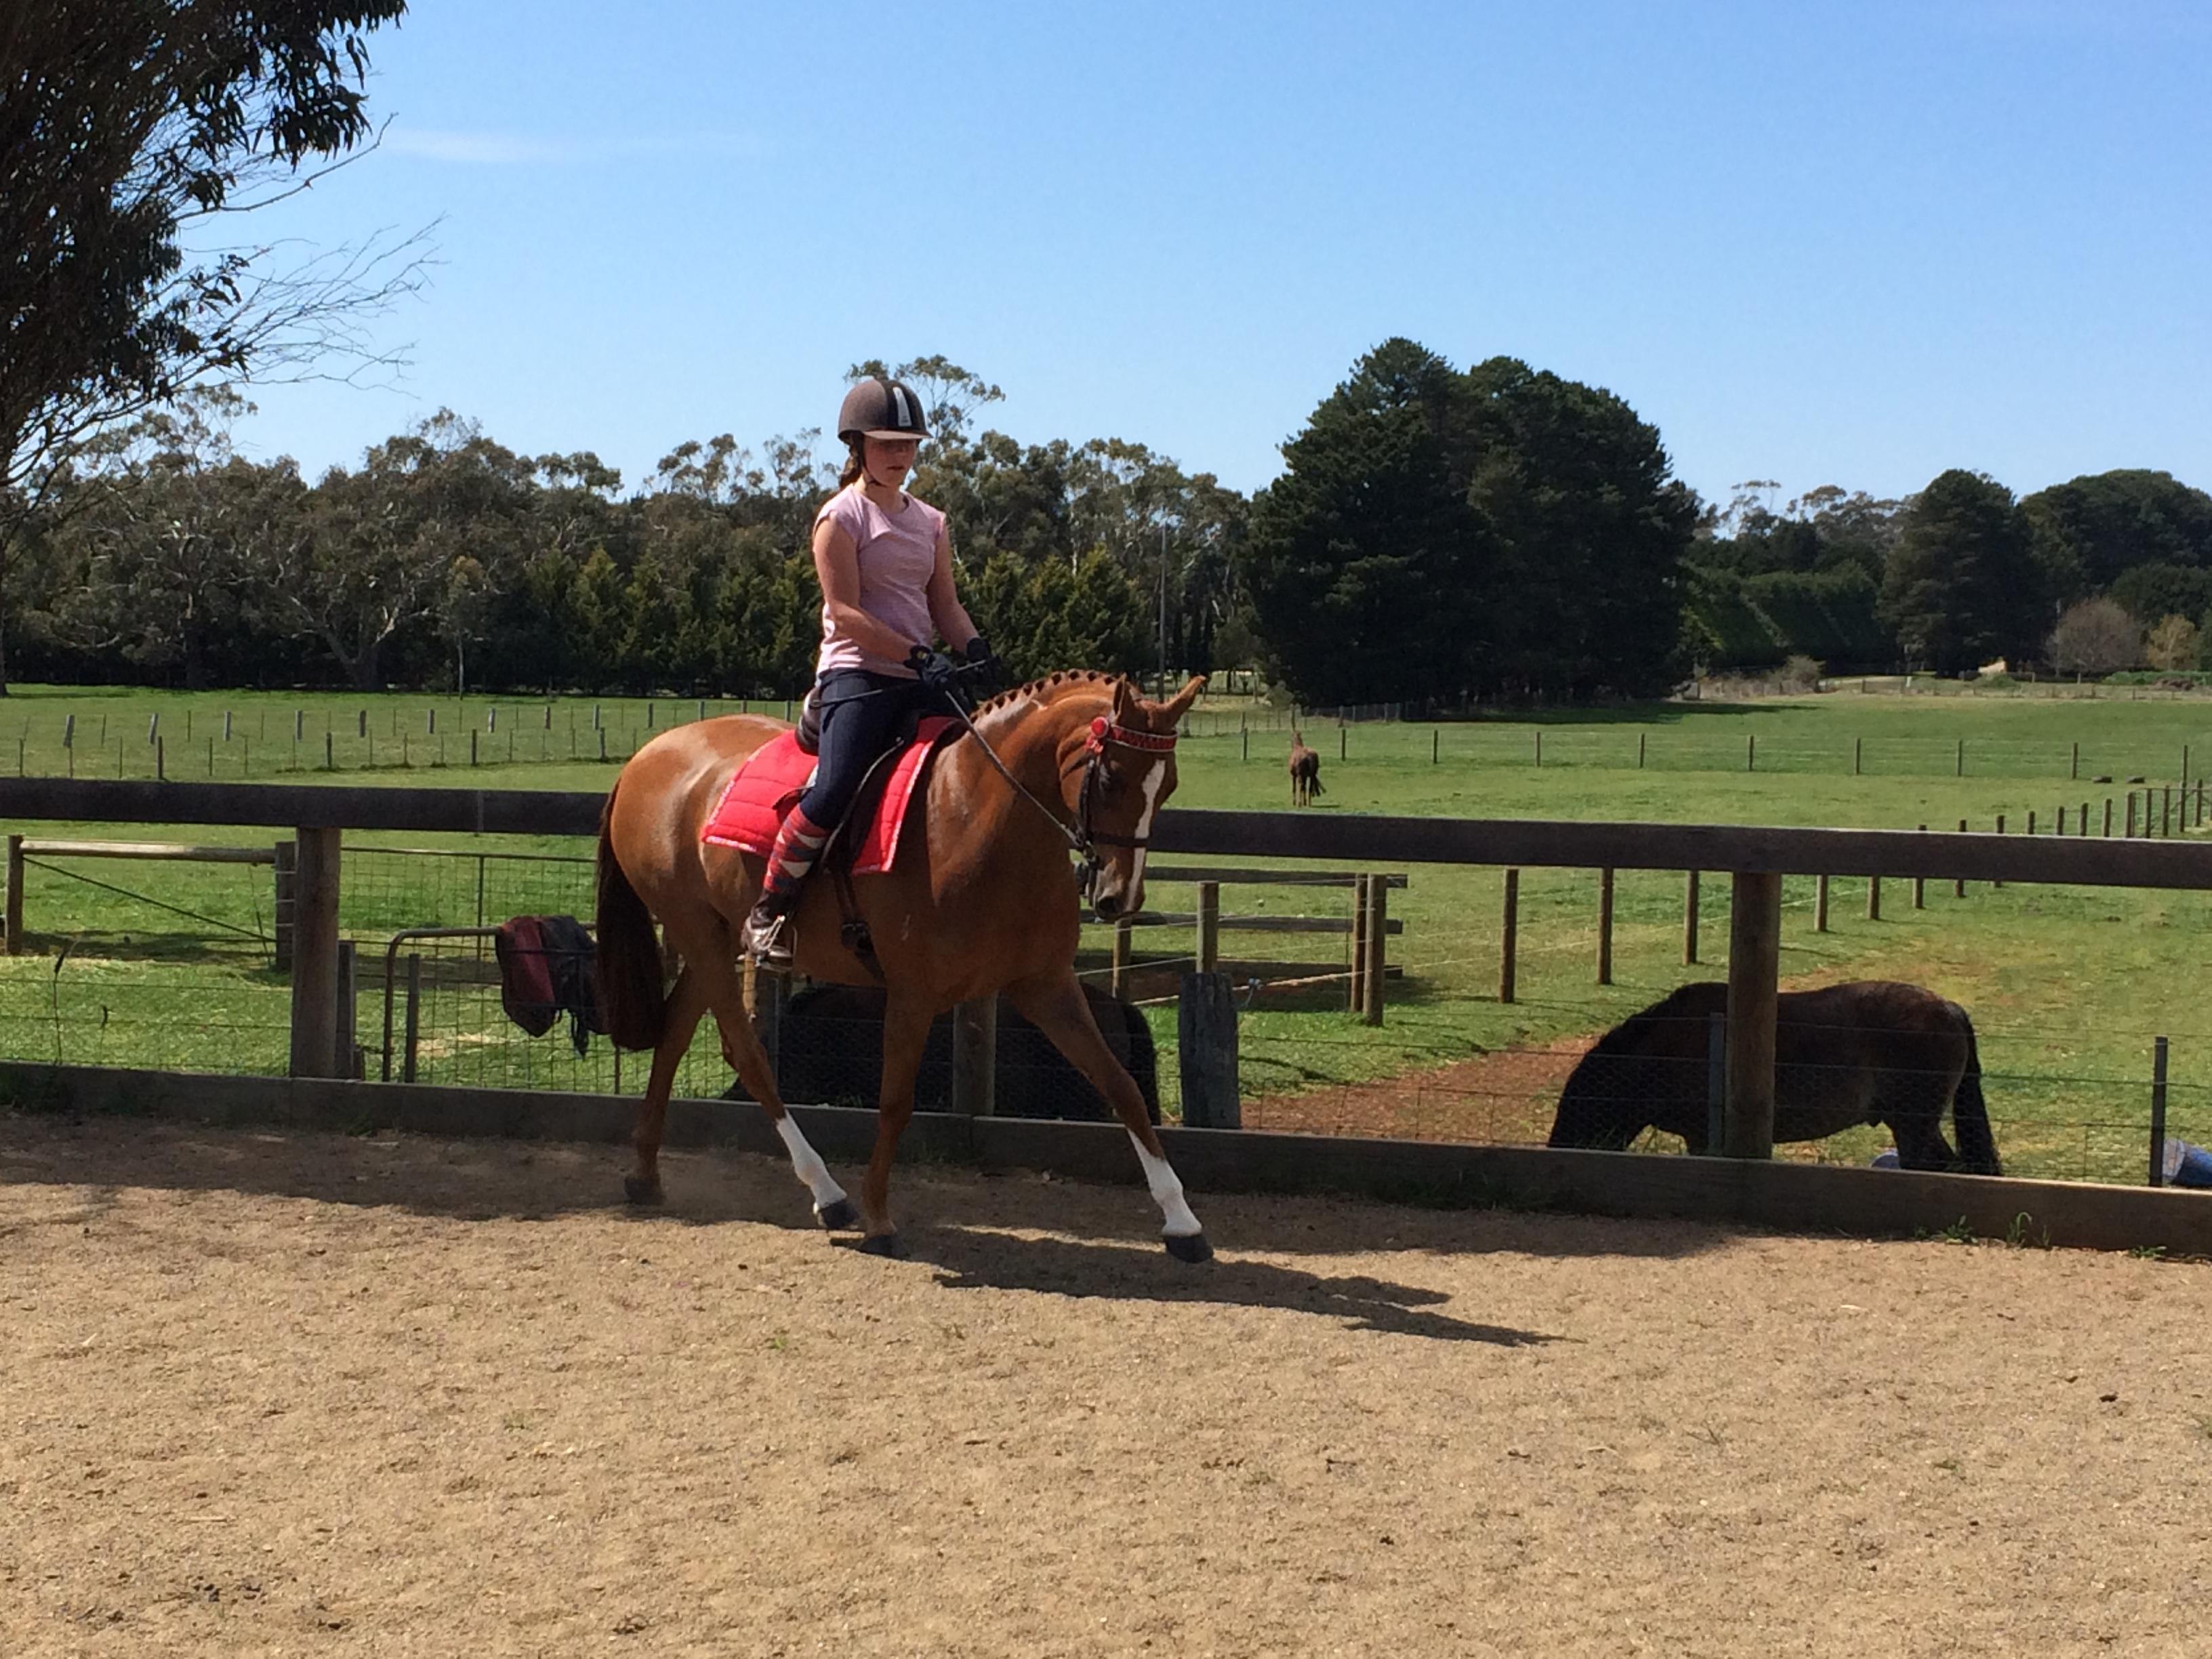 Large show/dressage pony